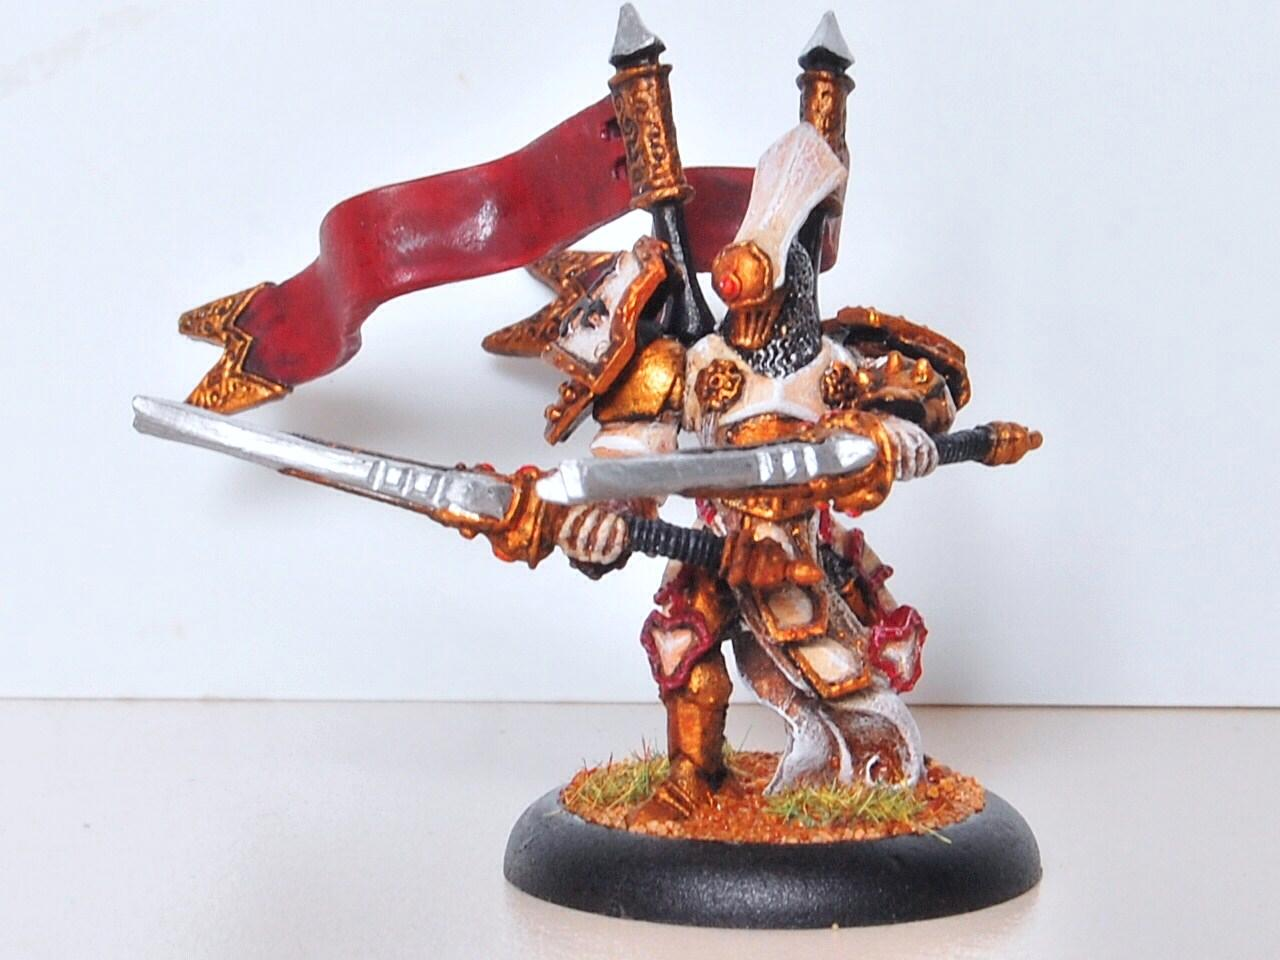 Hordes, Knight Exemplar, Pom, Protectorate Of Menoth, Senechal, Solo, Warmachine